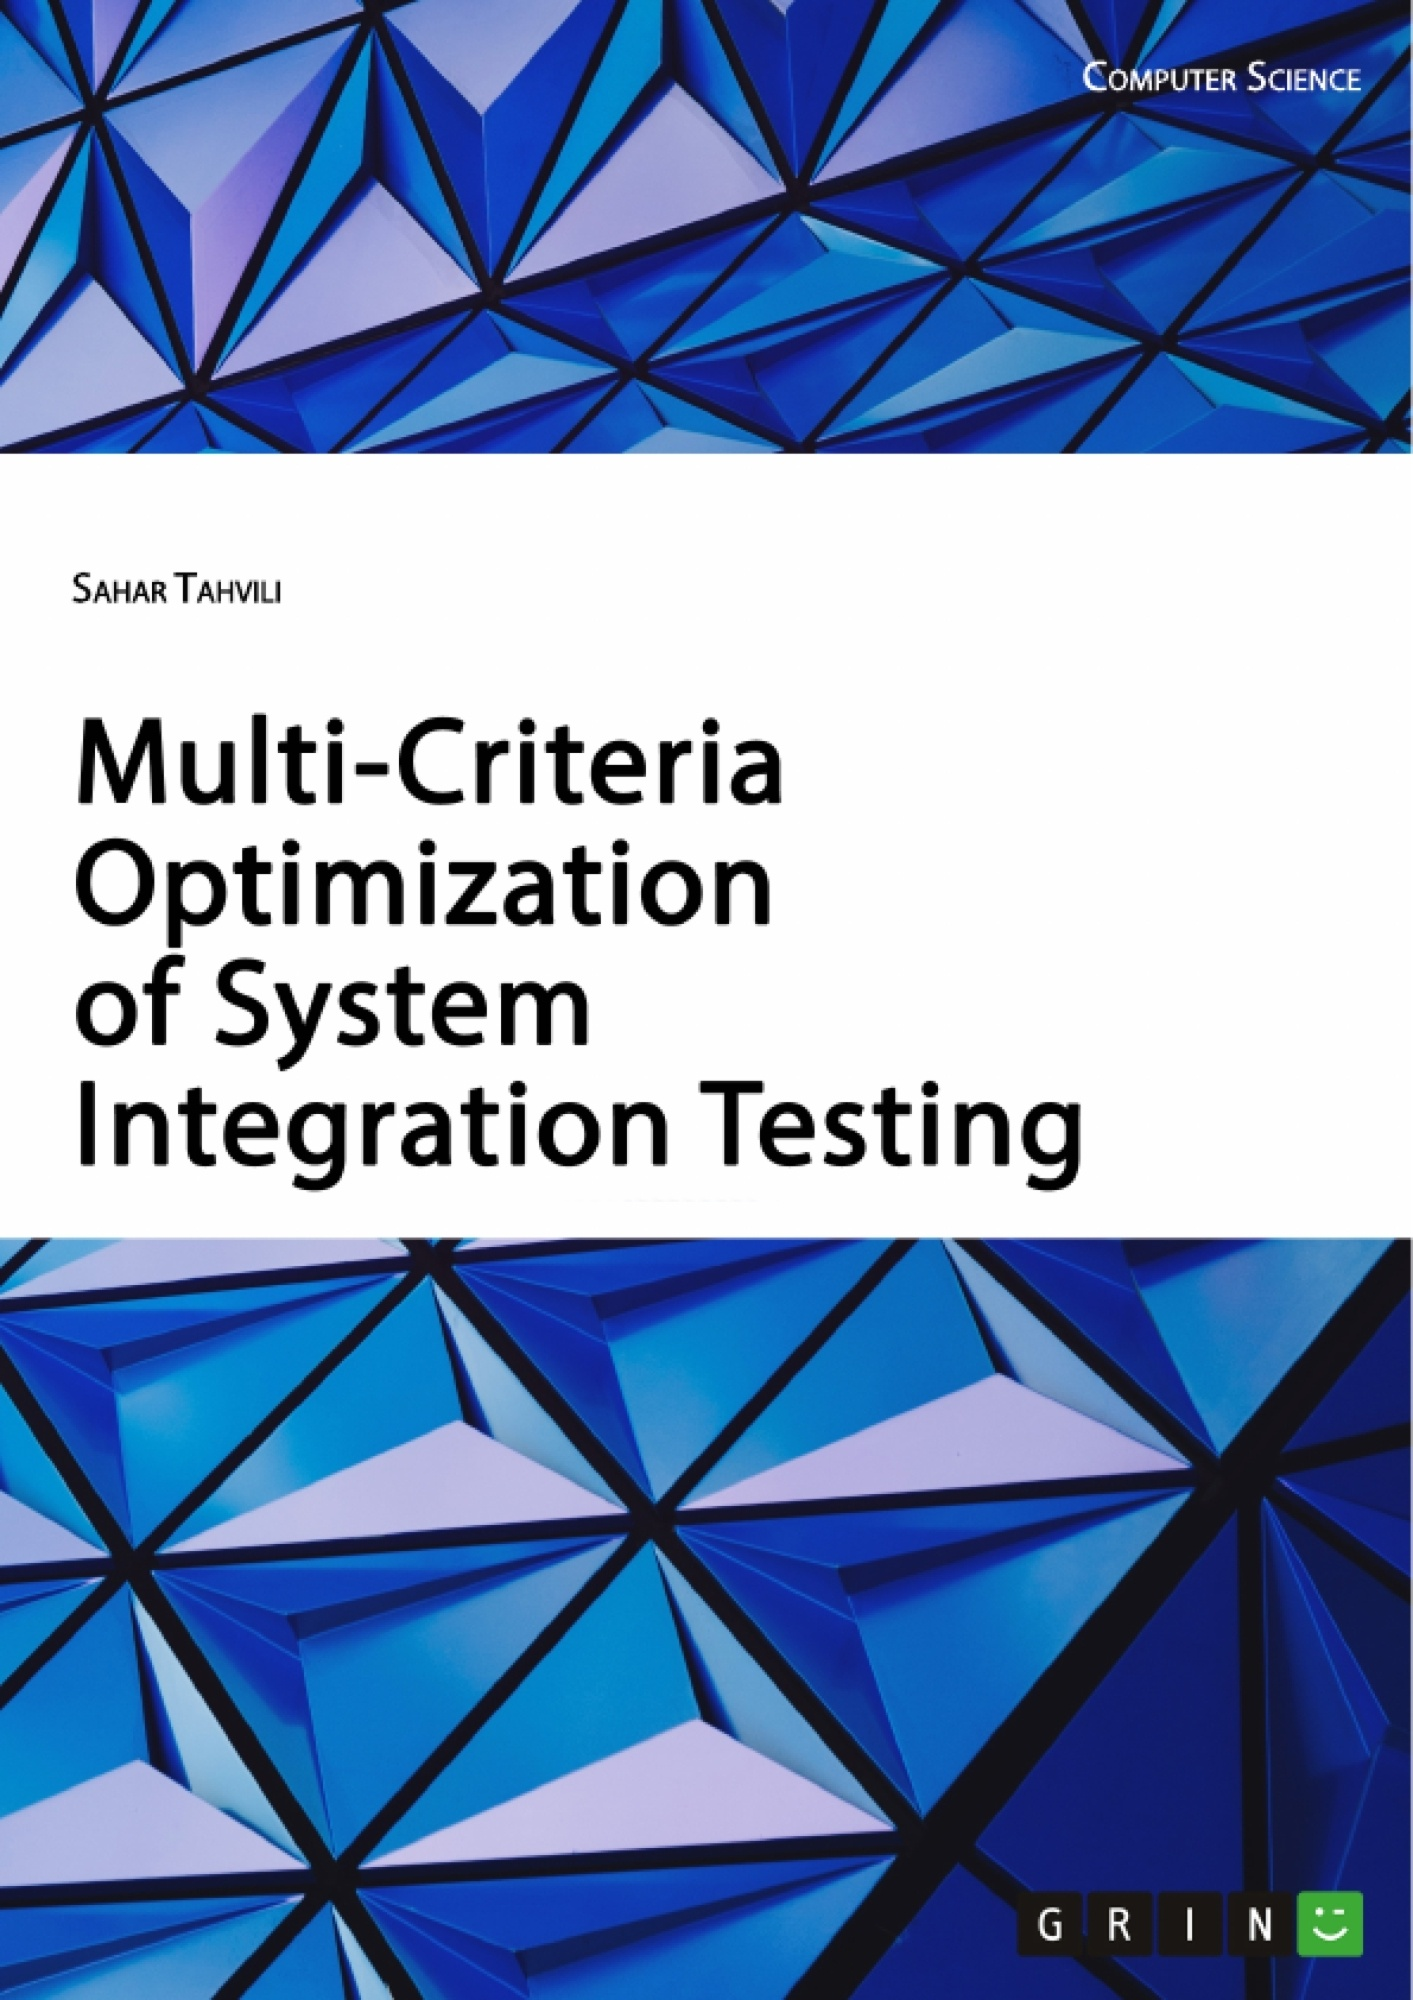 multicriterion optimization ph d thesis